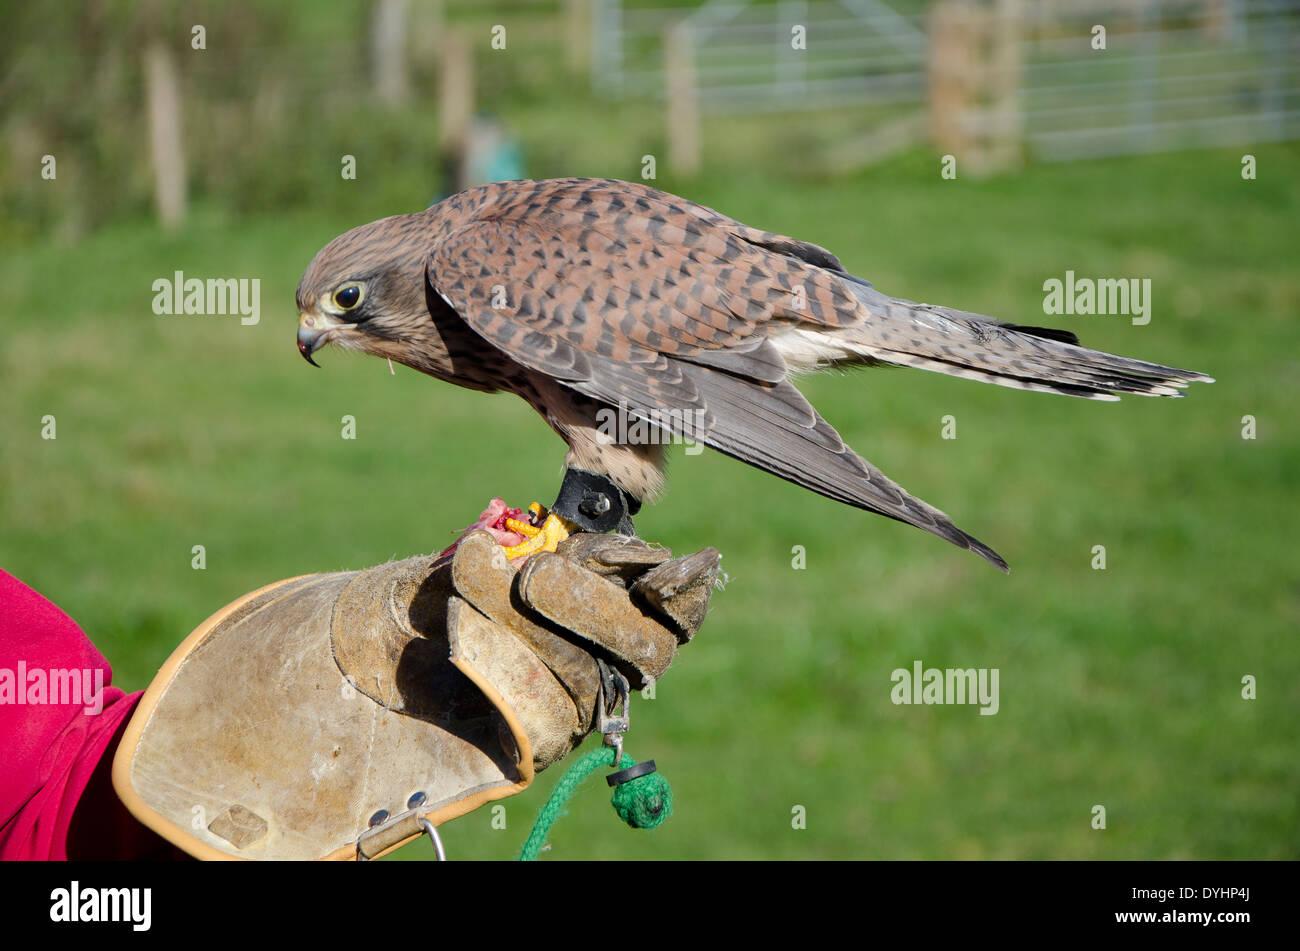 Turmfalken in einer Falknerei-Anzeige. Falco tinnunculus Stockbild